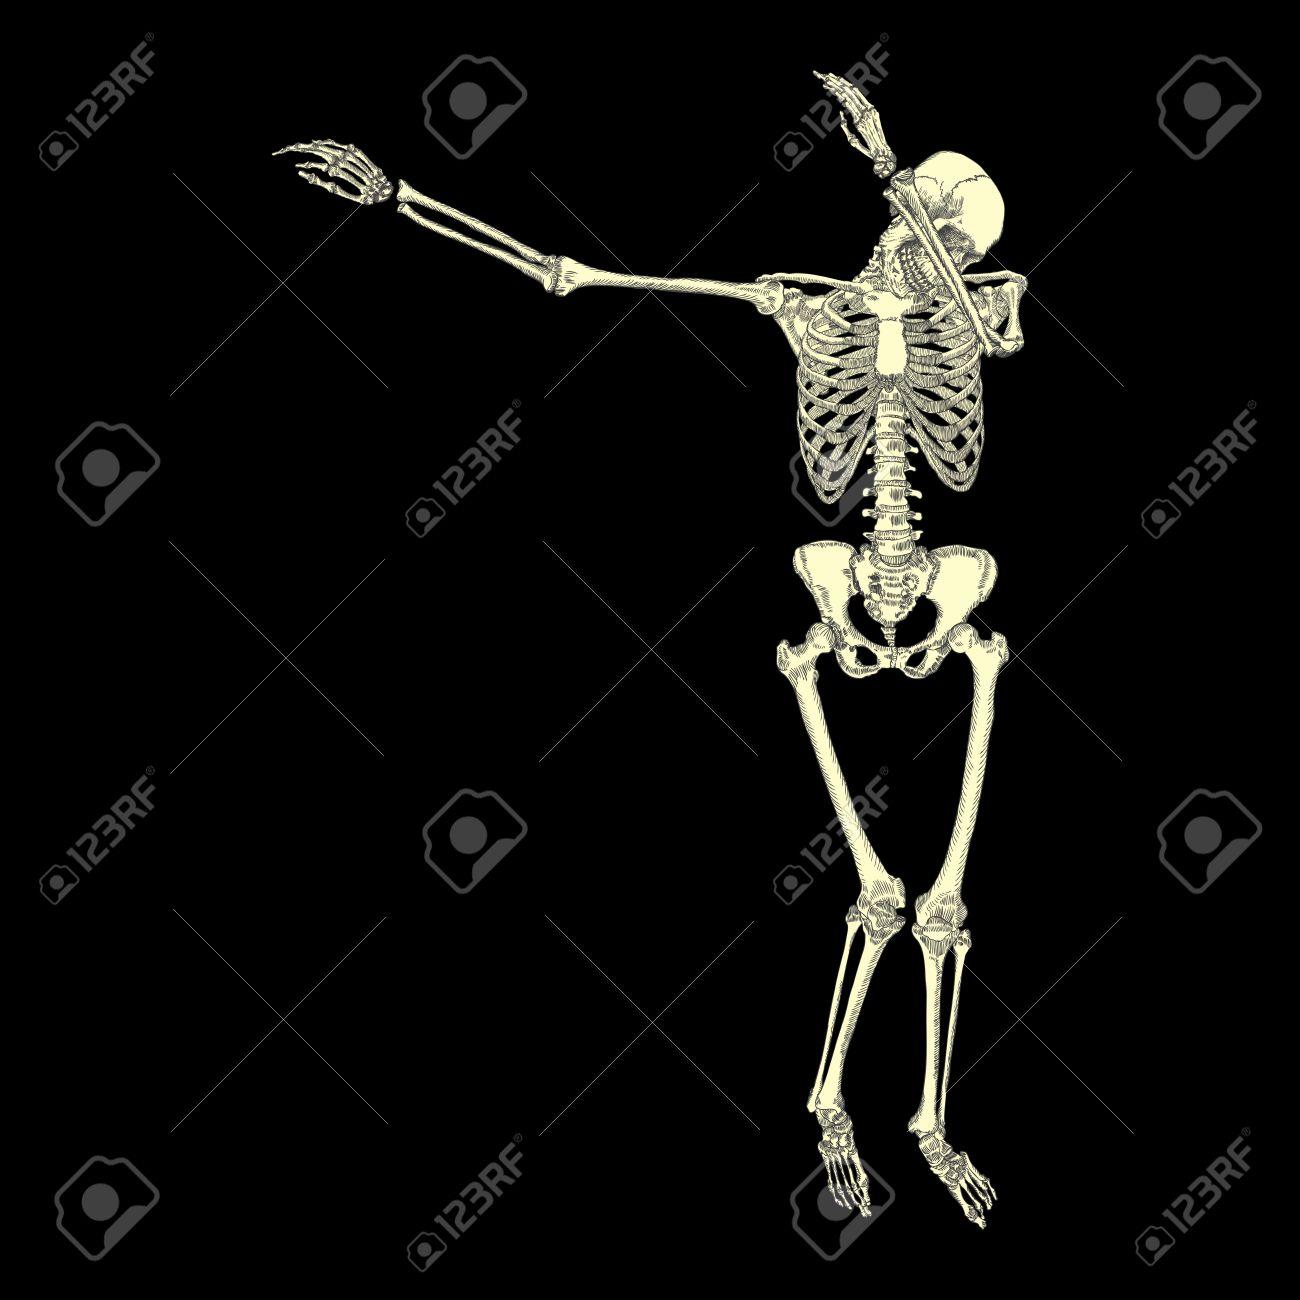 Human skeleton posing DAB, perform dabbing dance move gesture,